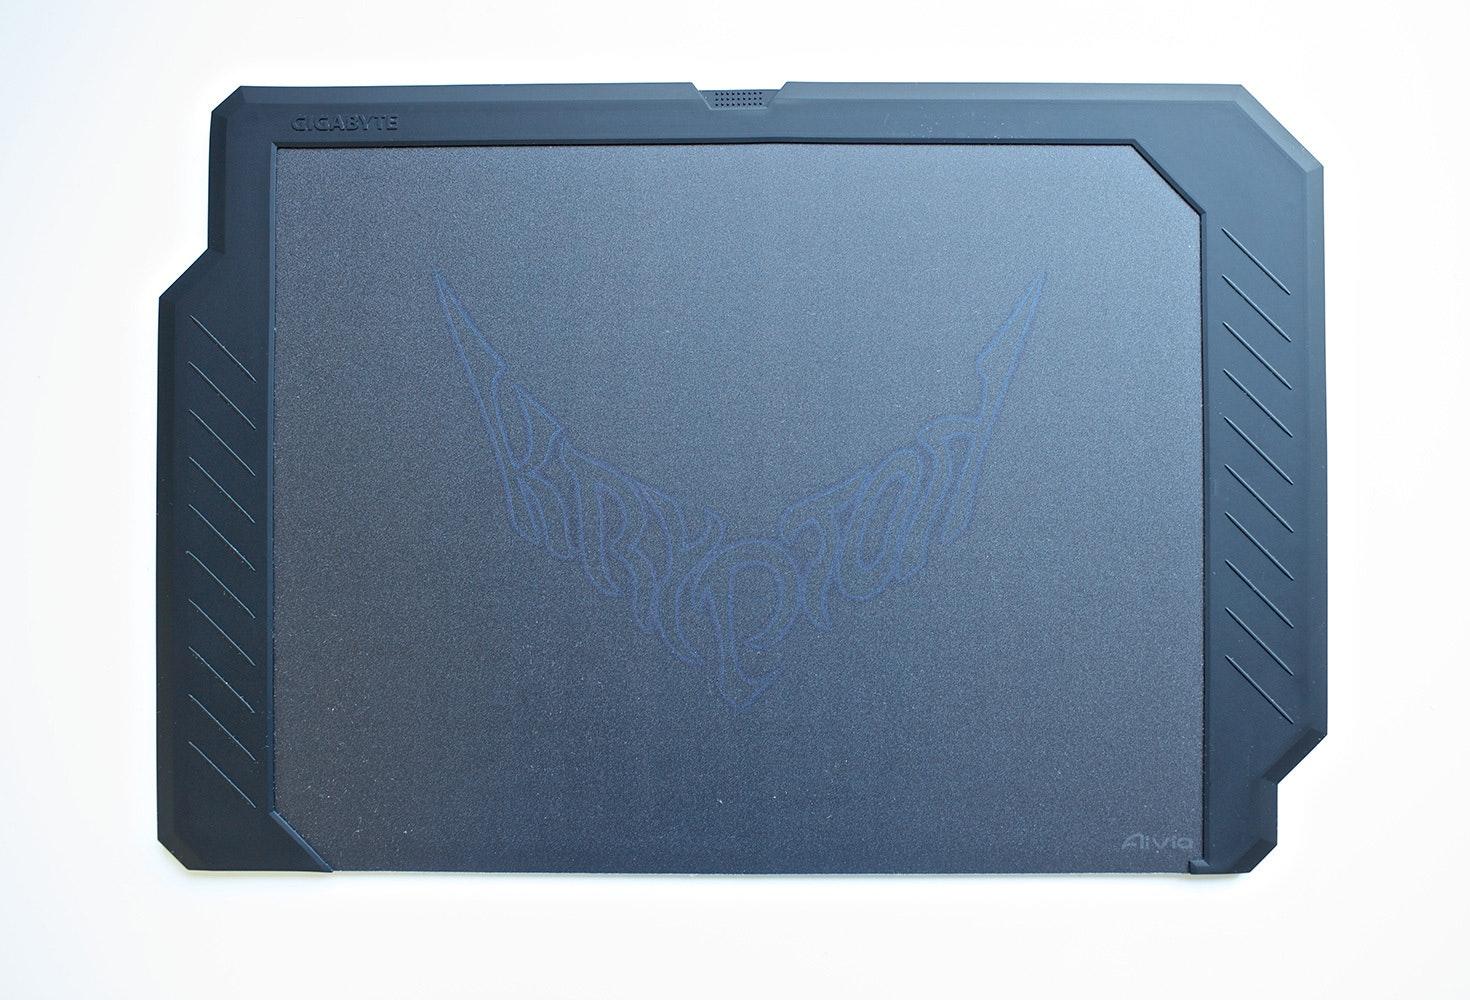 Aivia Krypton Gaming Mouse Pad